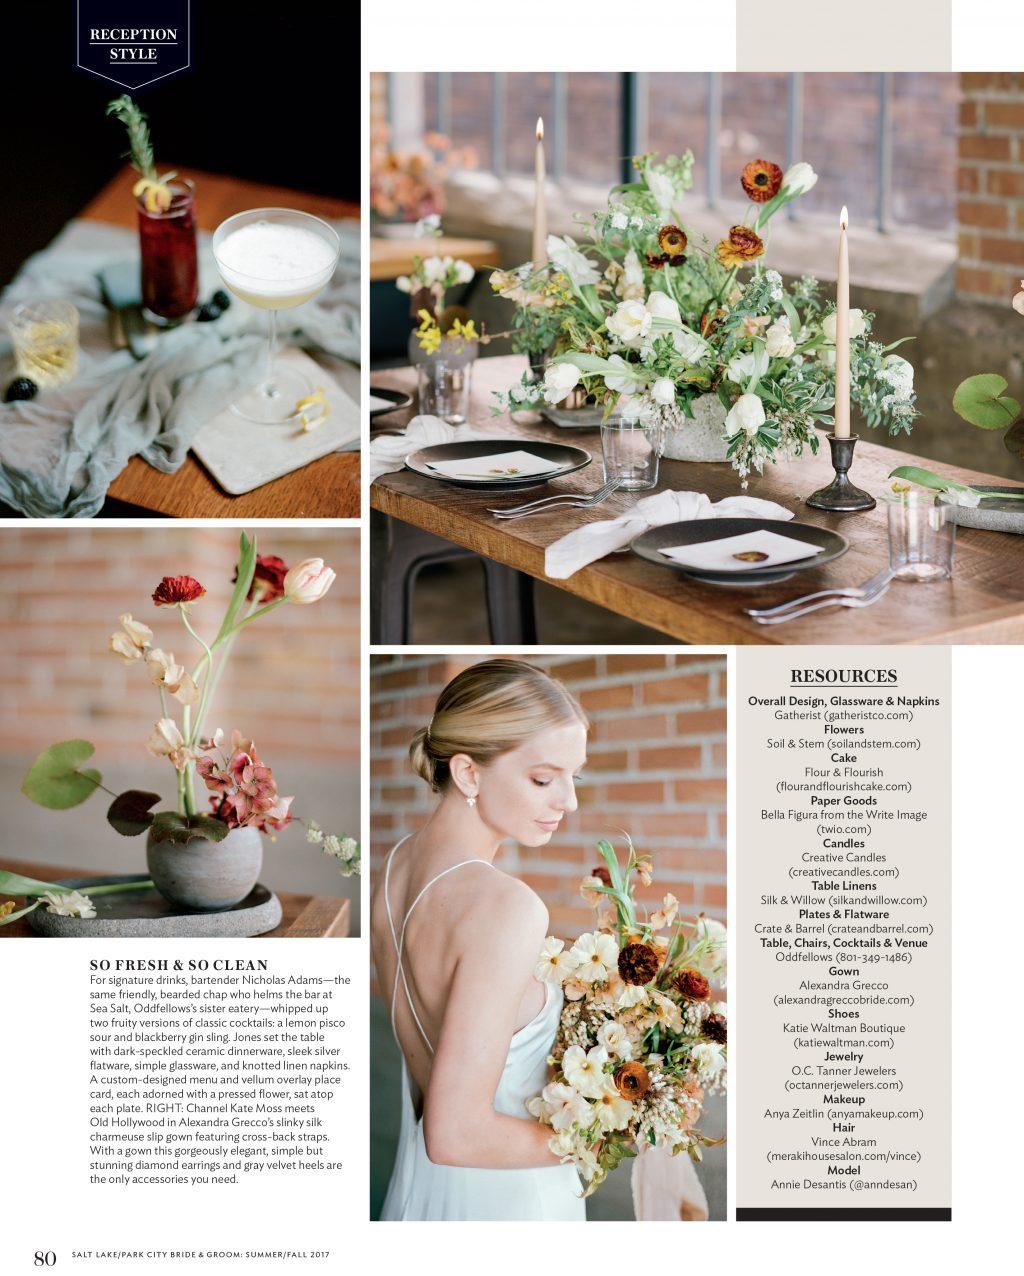 Bella Figura's Natura wedding invitations were featured in the Summer / Fall 2017 issue of Salt Lake / Park City Bride & Groom magazine